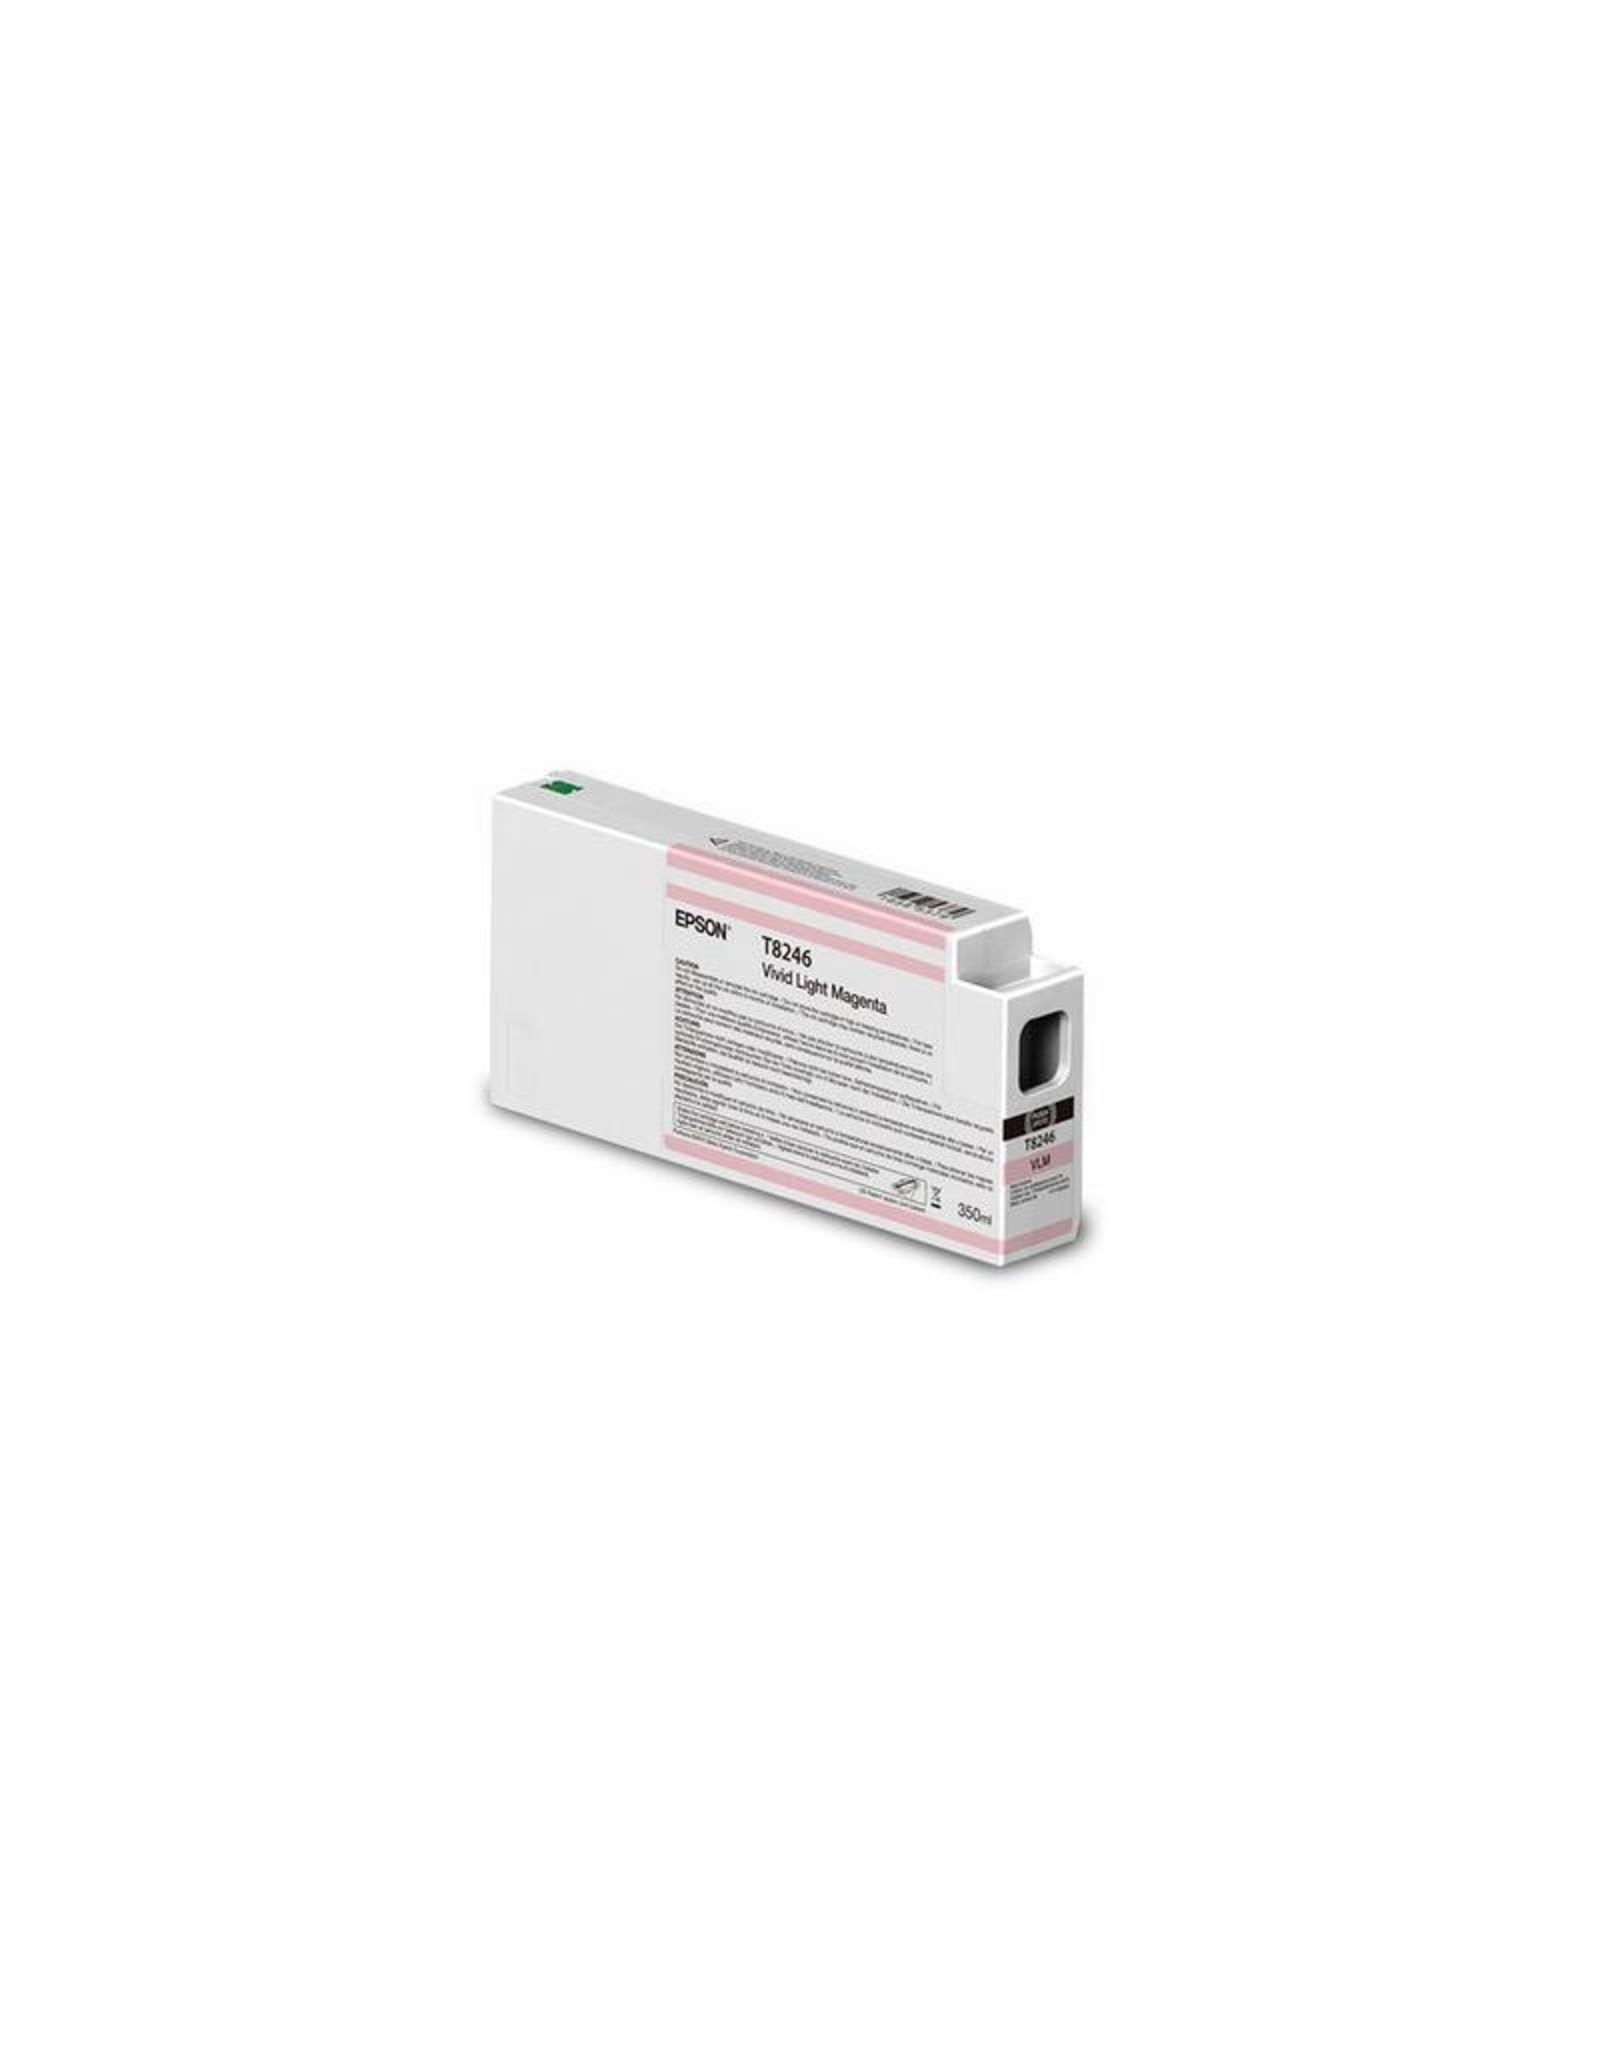 Epson Epson T824600 Ultrachrome HD Vivid Light Magenta Ink 350ML